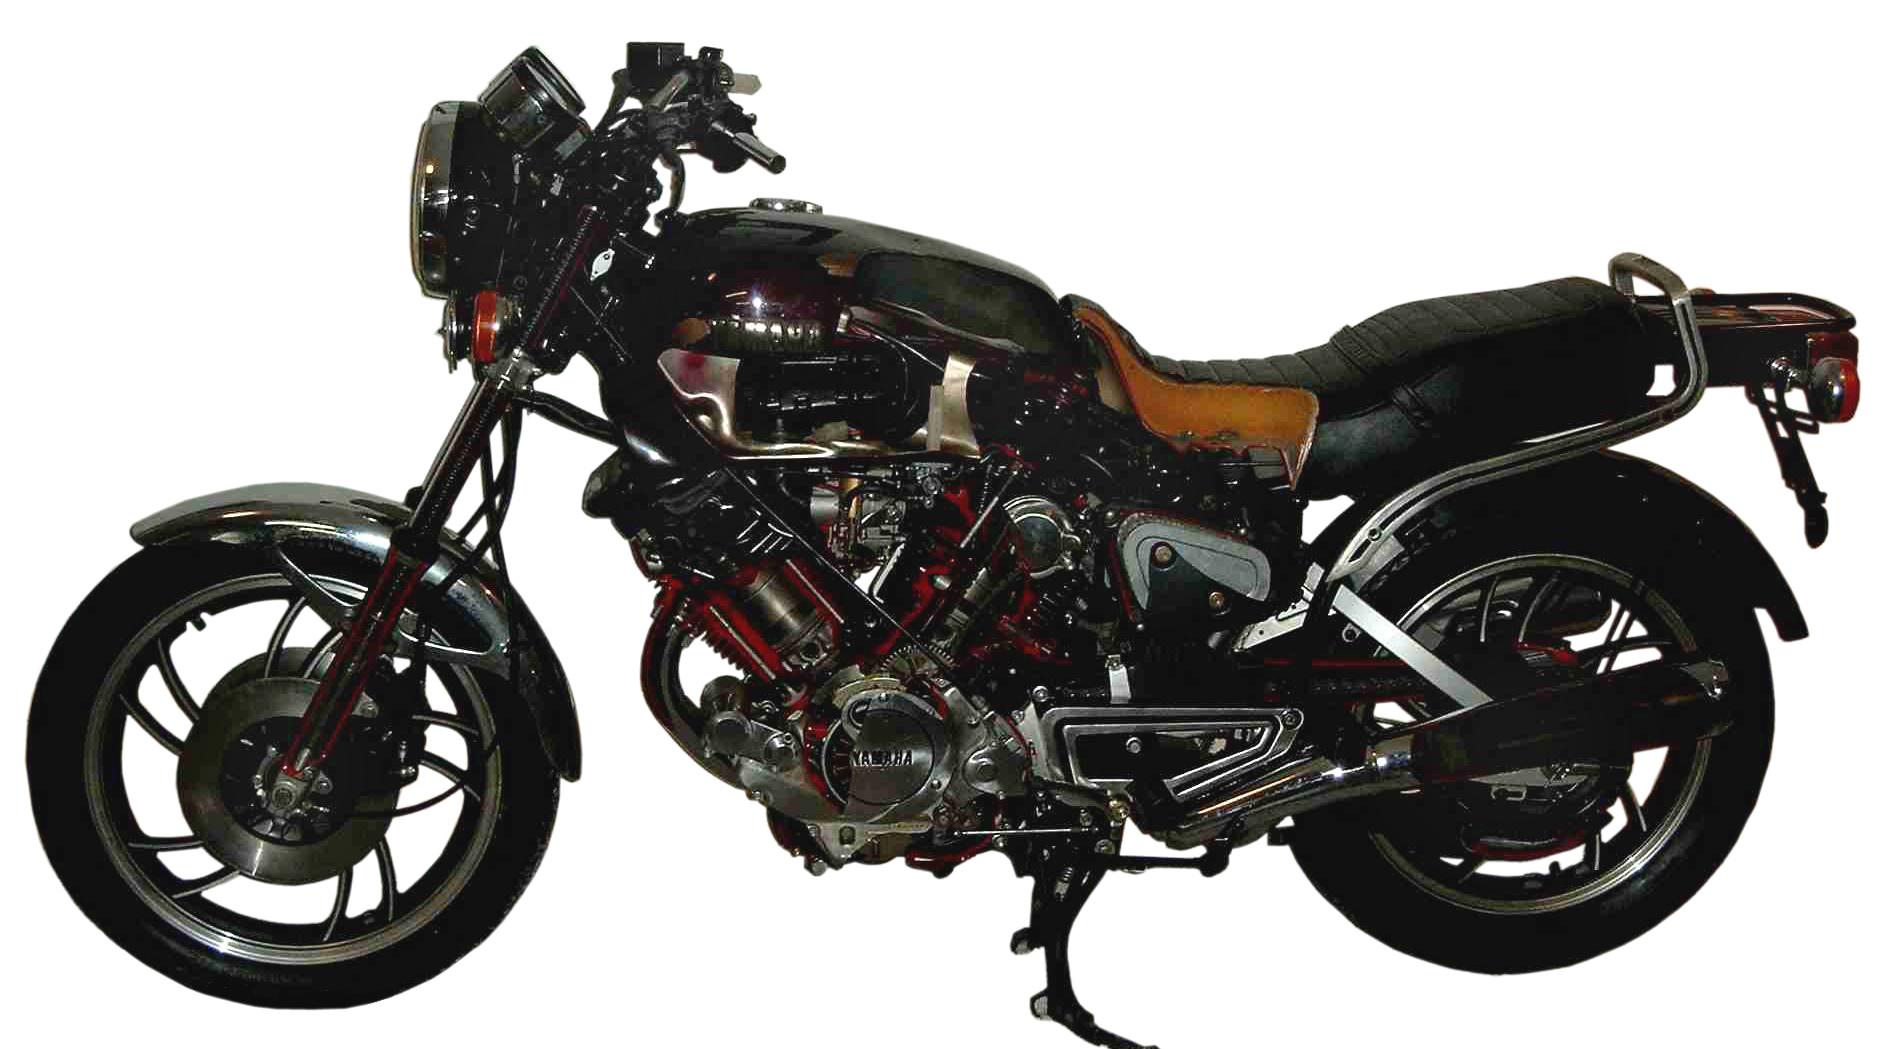 Yamaha Schnittmodell TR 1